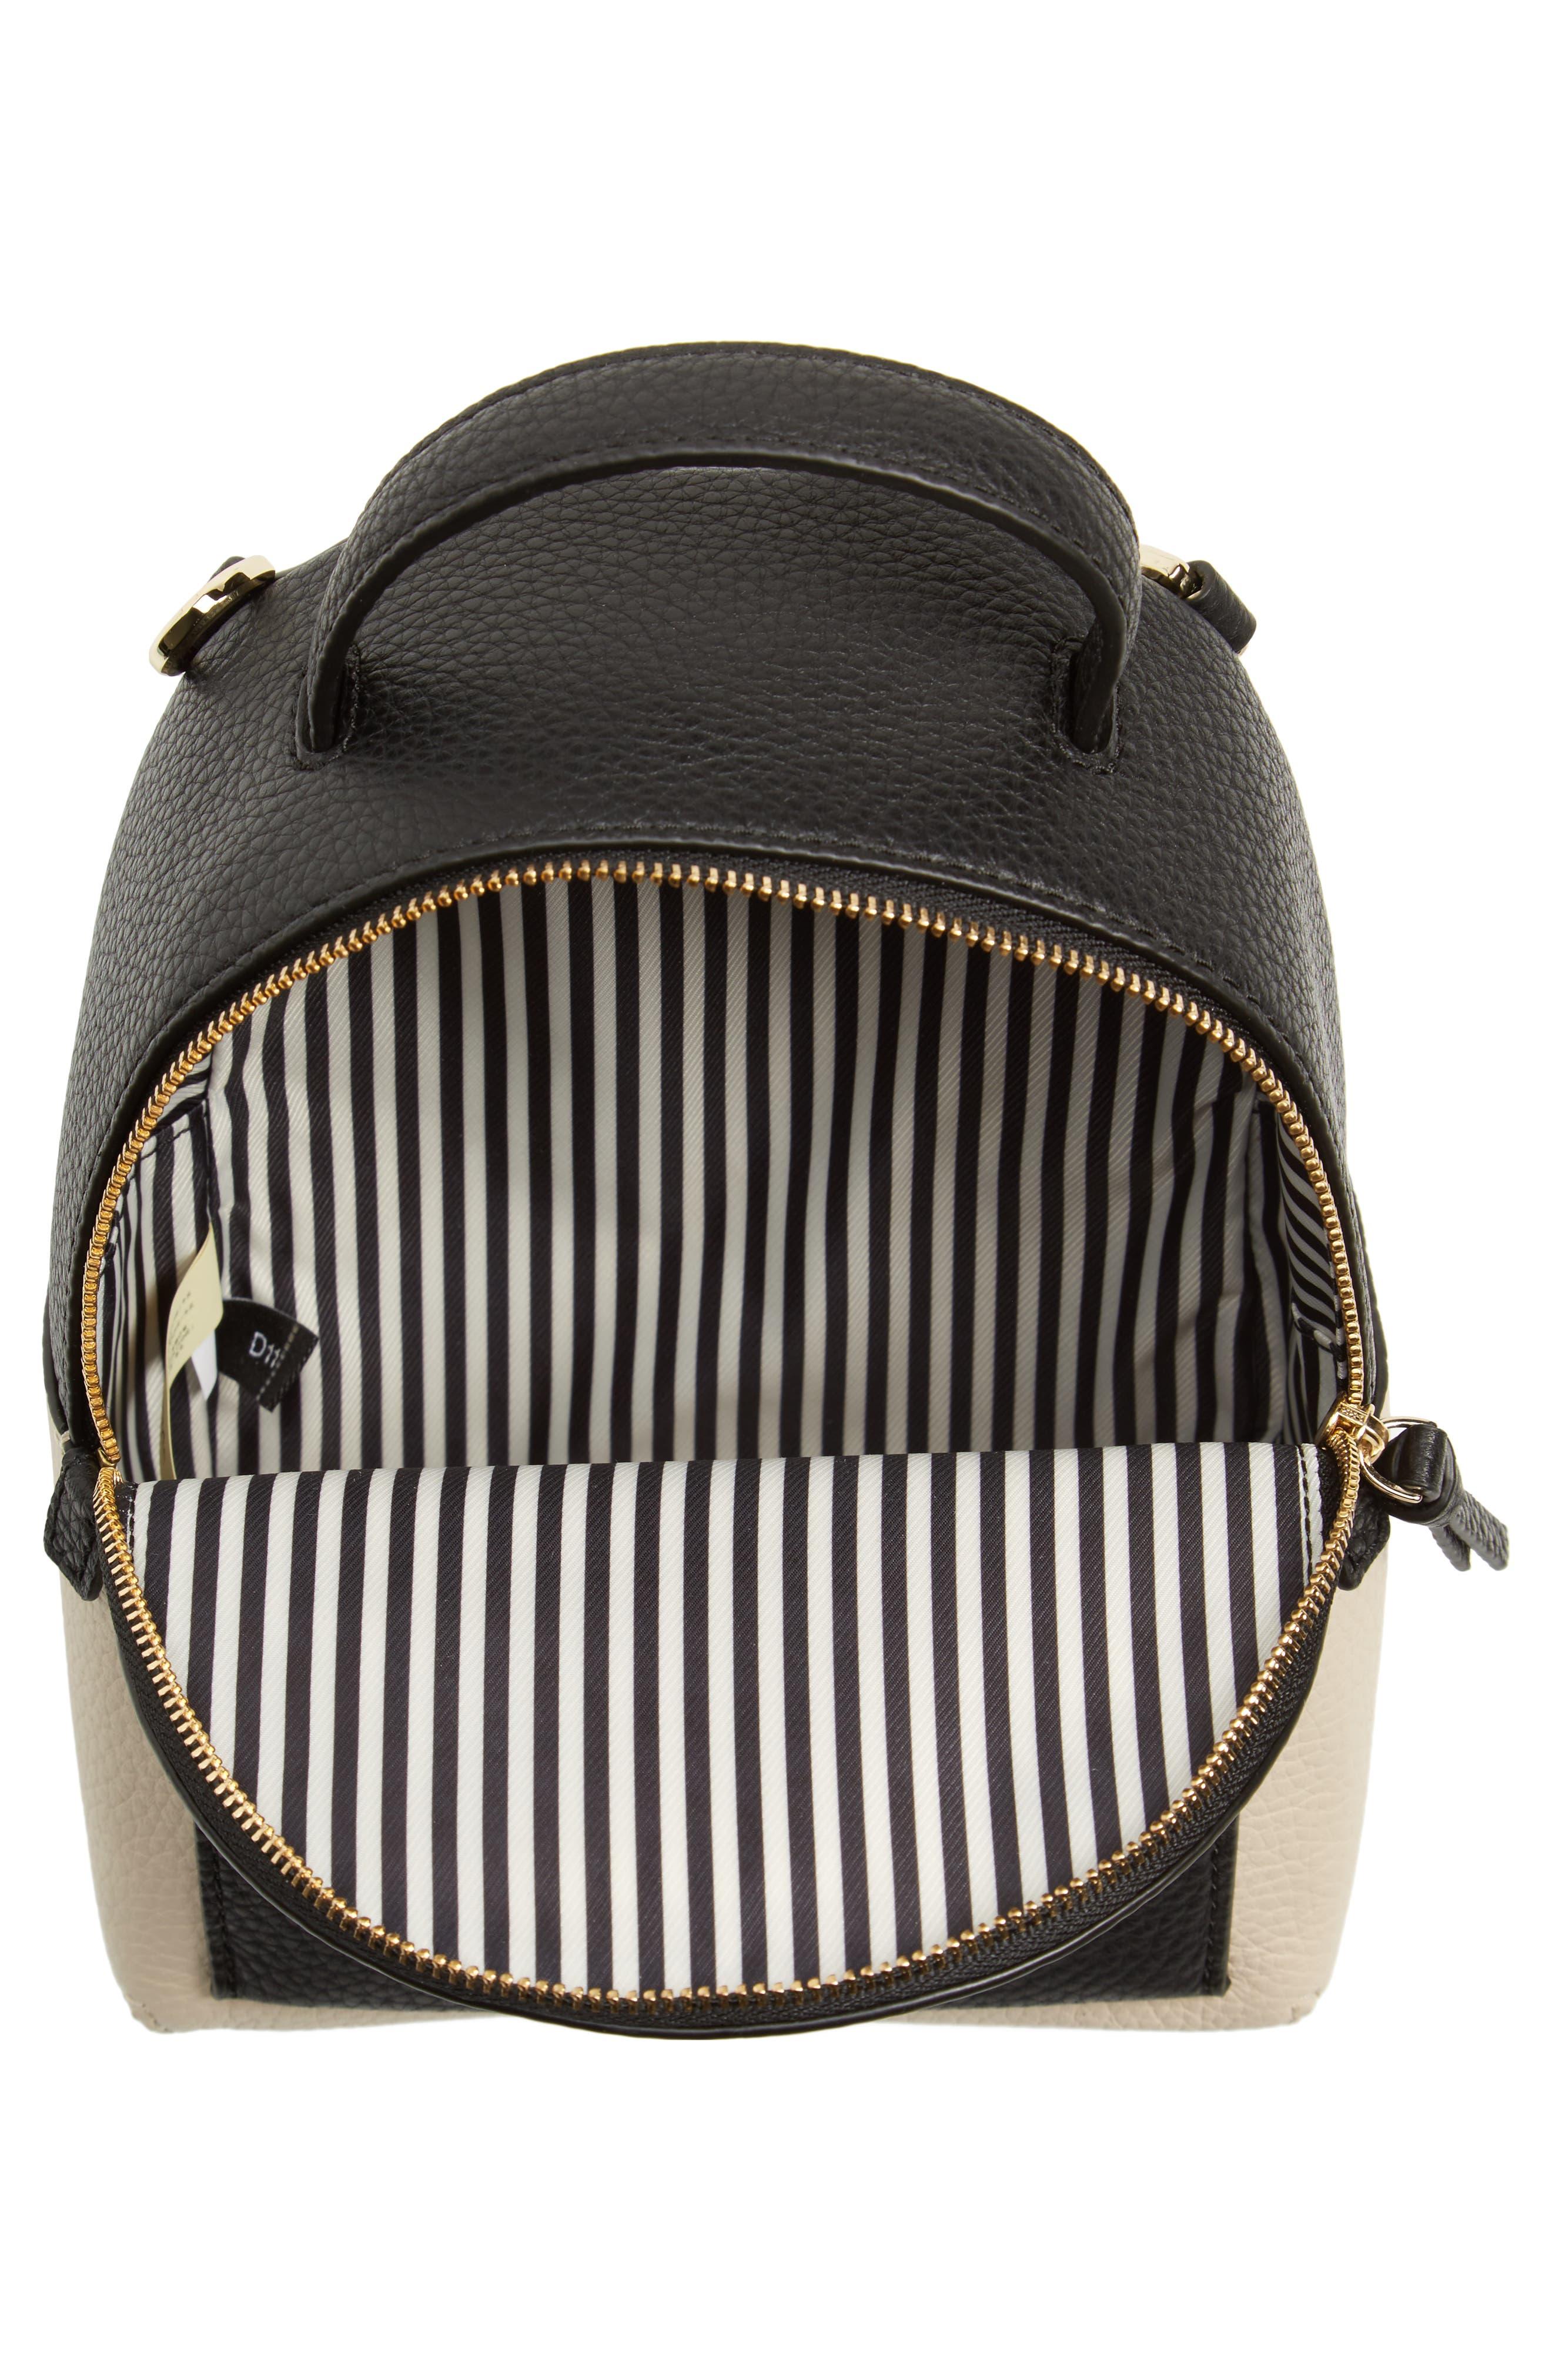 jackson street merry convertible leather backpack,                             Alternate thumbnail 4, color,                             Black/ Soft Porcelain